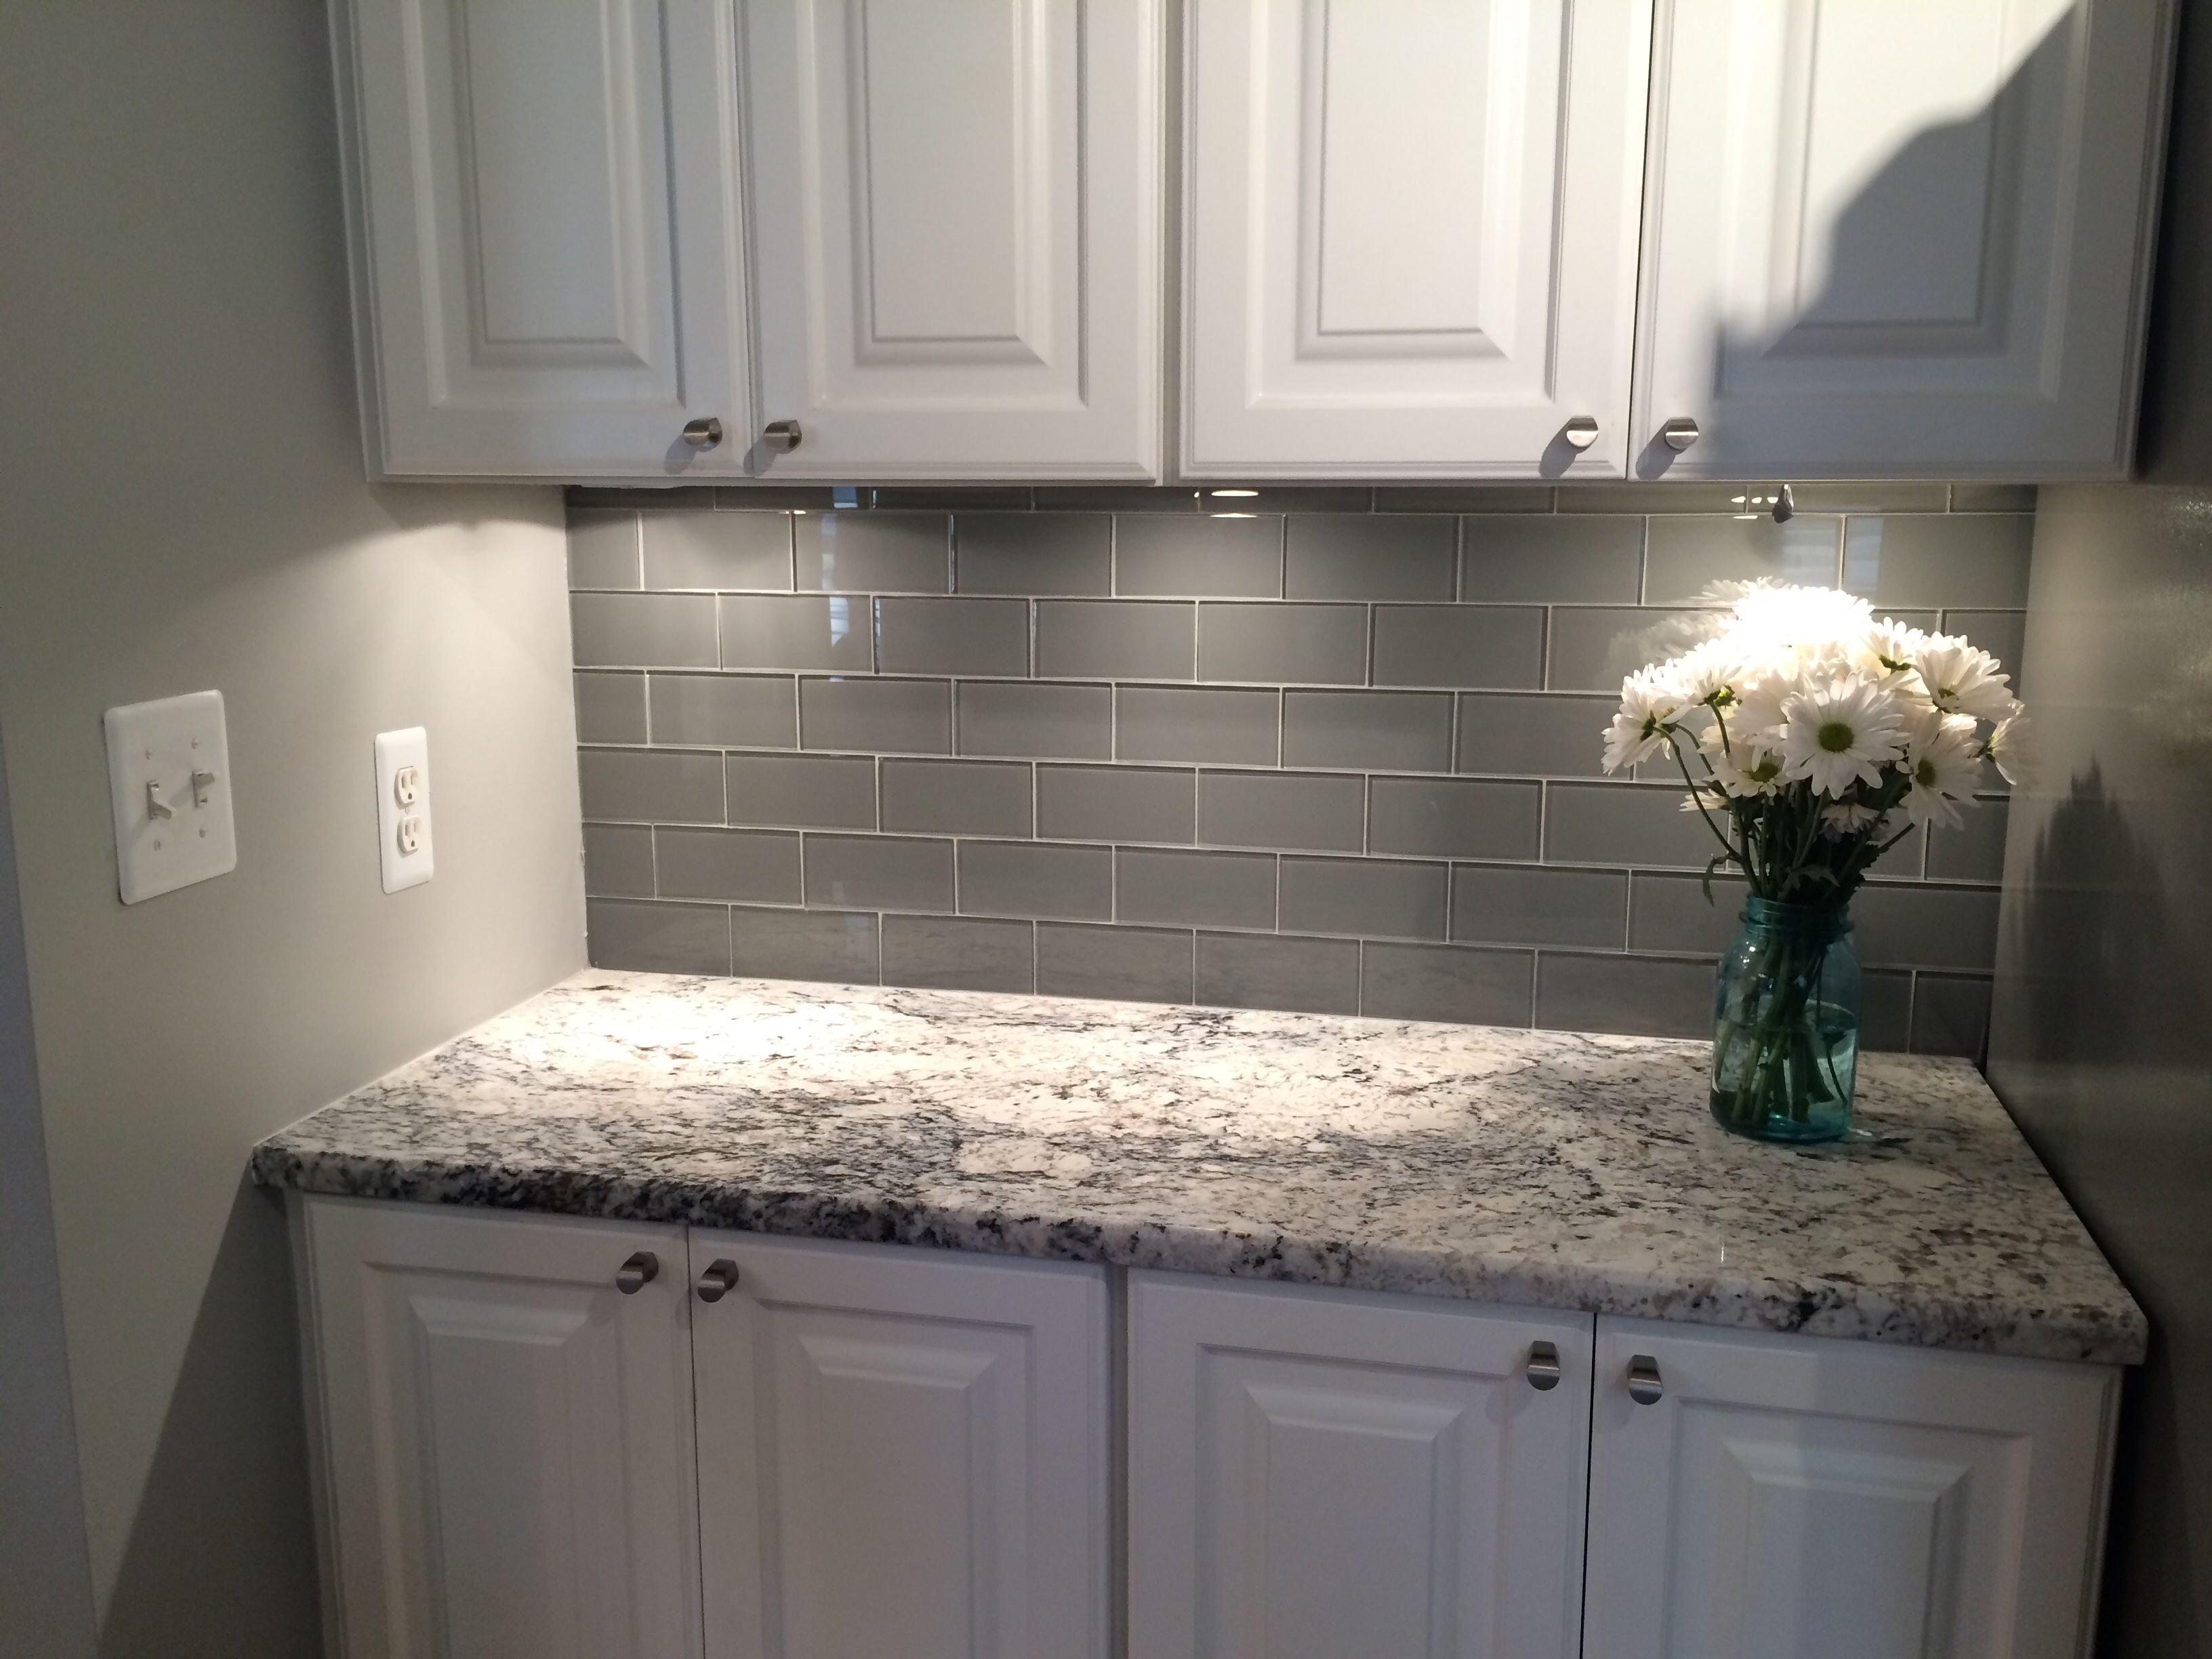 10 Gorgeous Subway Tile Kitchen Backsplash Ideas grey glass subway tile backsplash and white cabinet for small space 1 2020